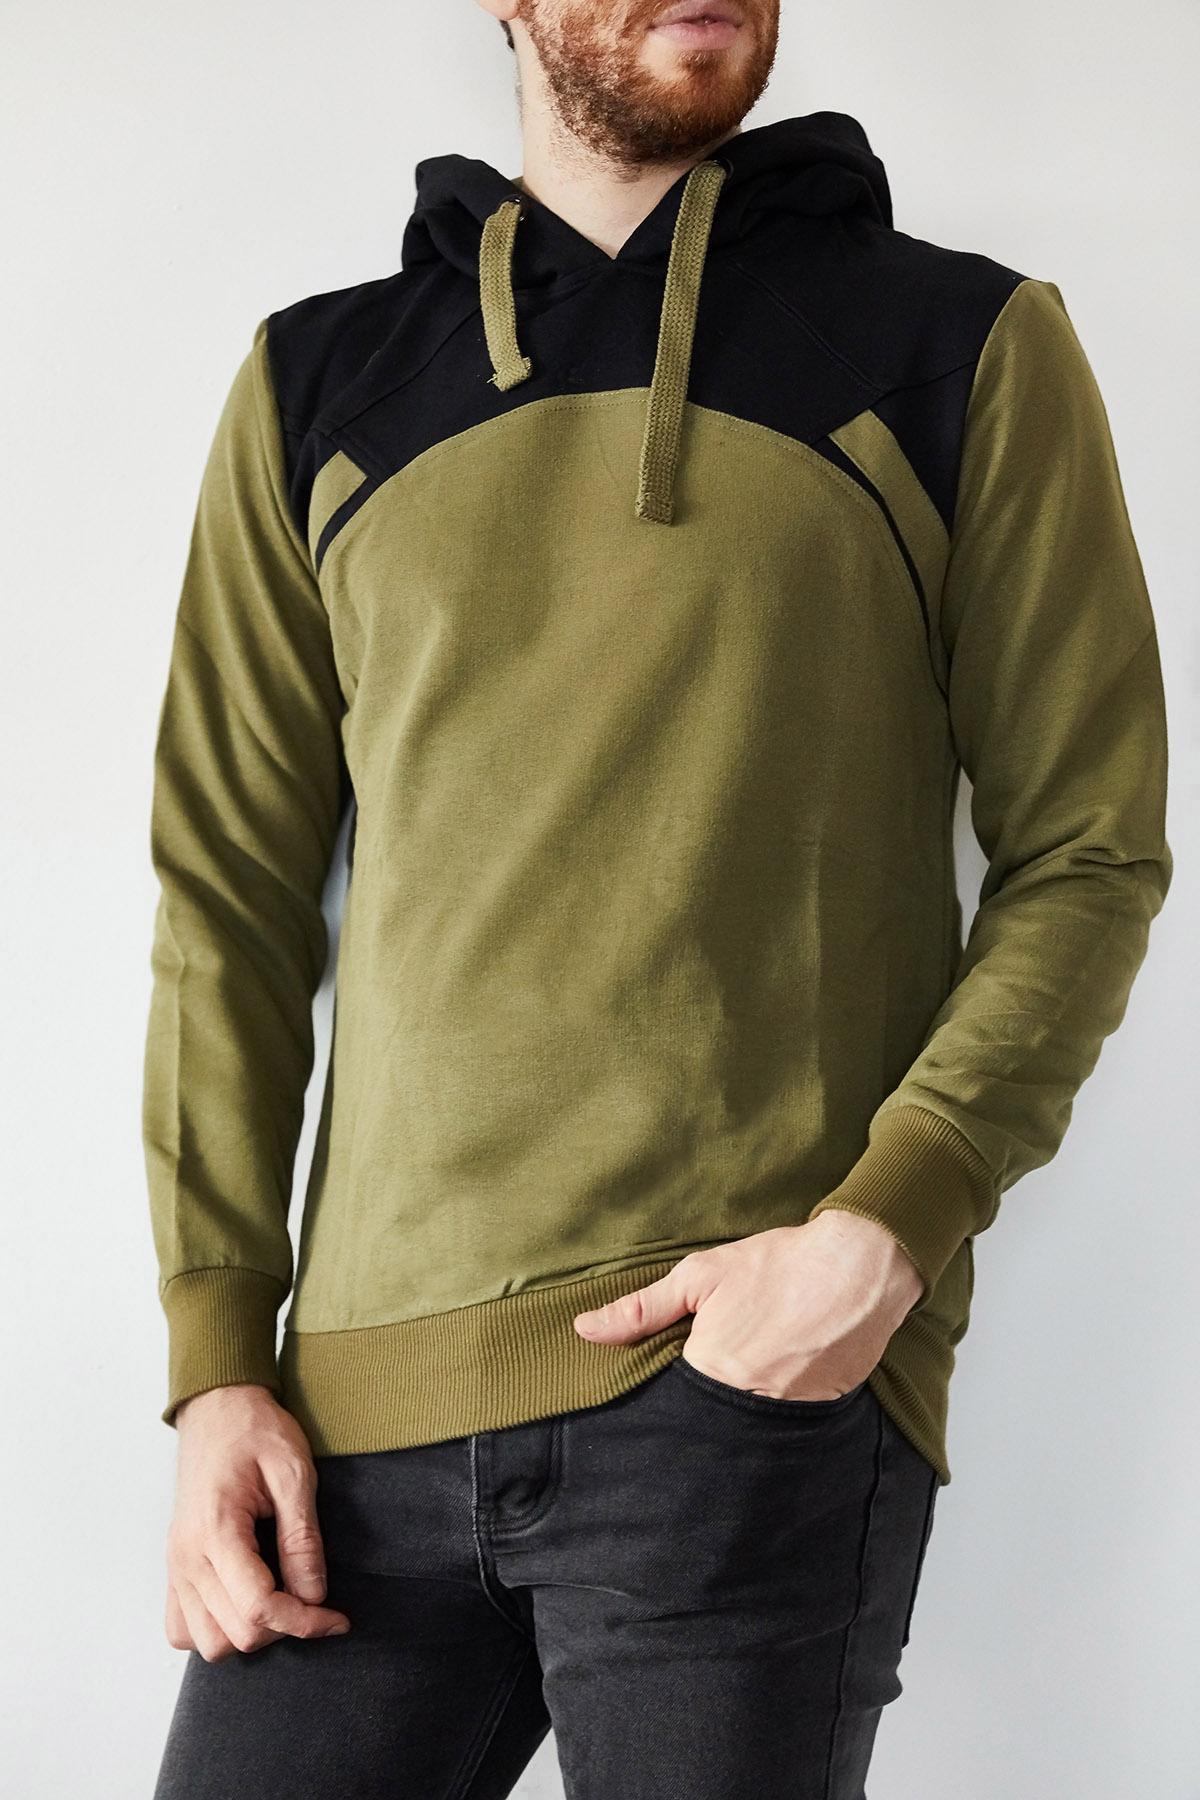 XHAN - Haki & Siyah Bloklu Sweatshirt 1KXE8-44173-09